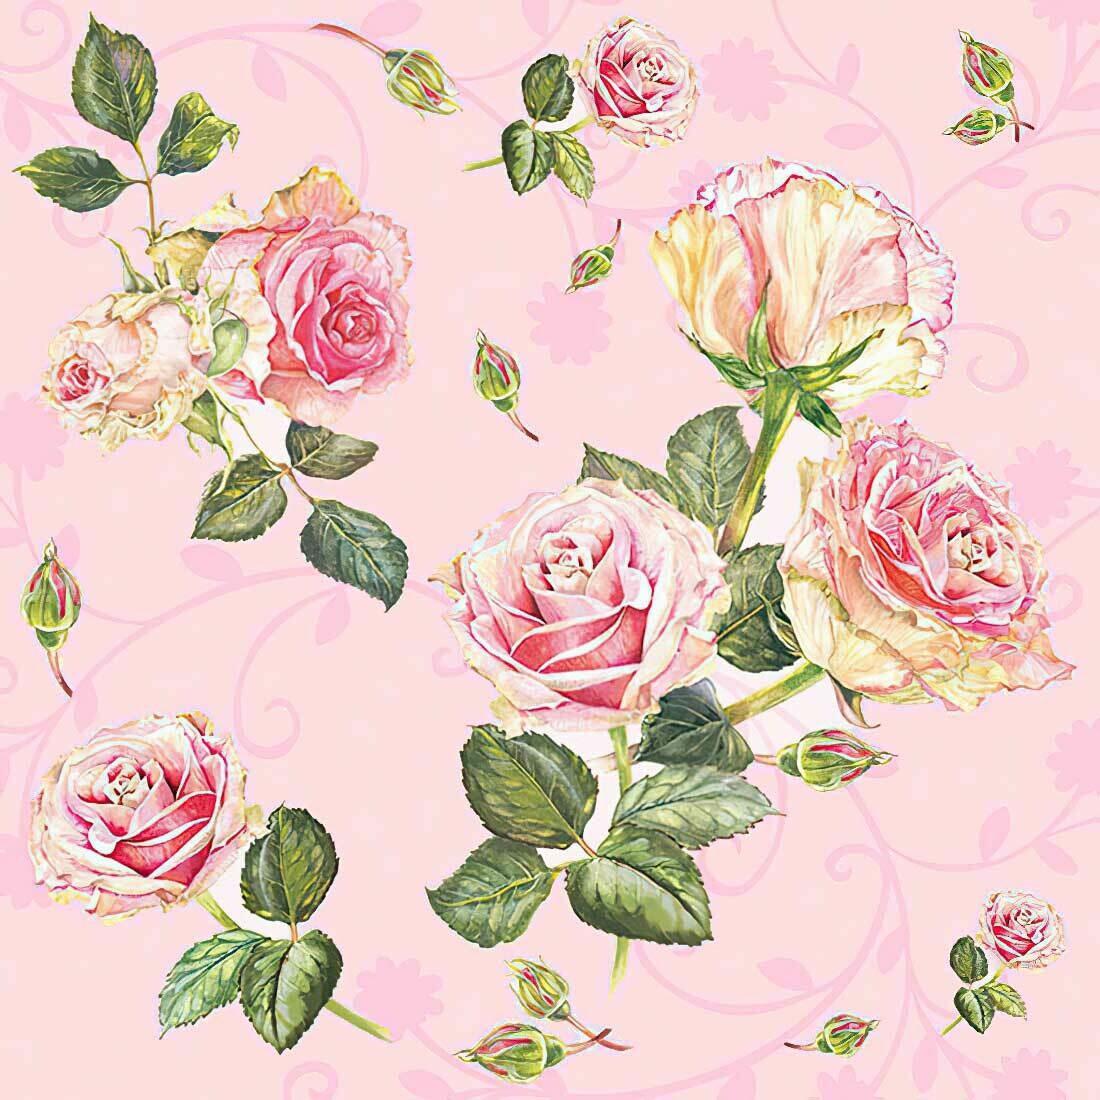 Decoupage Paper Napkins -Floral Rosie Rose - Baby Pink (1 Sheet)